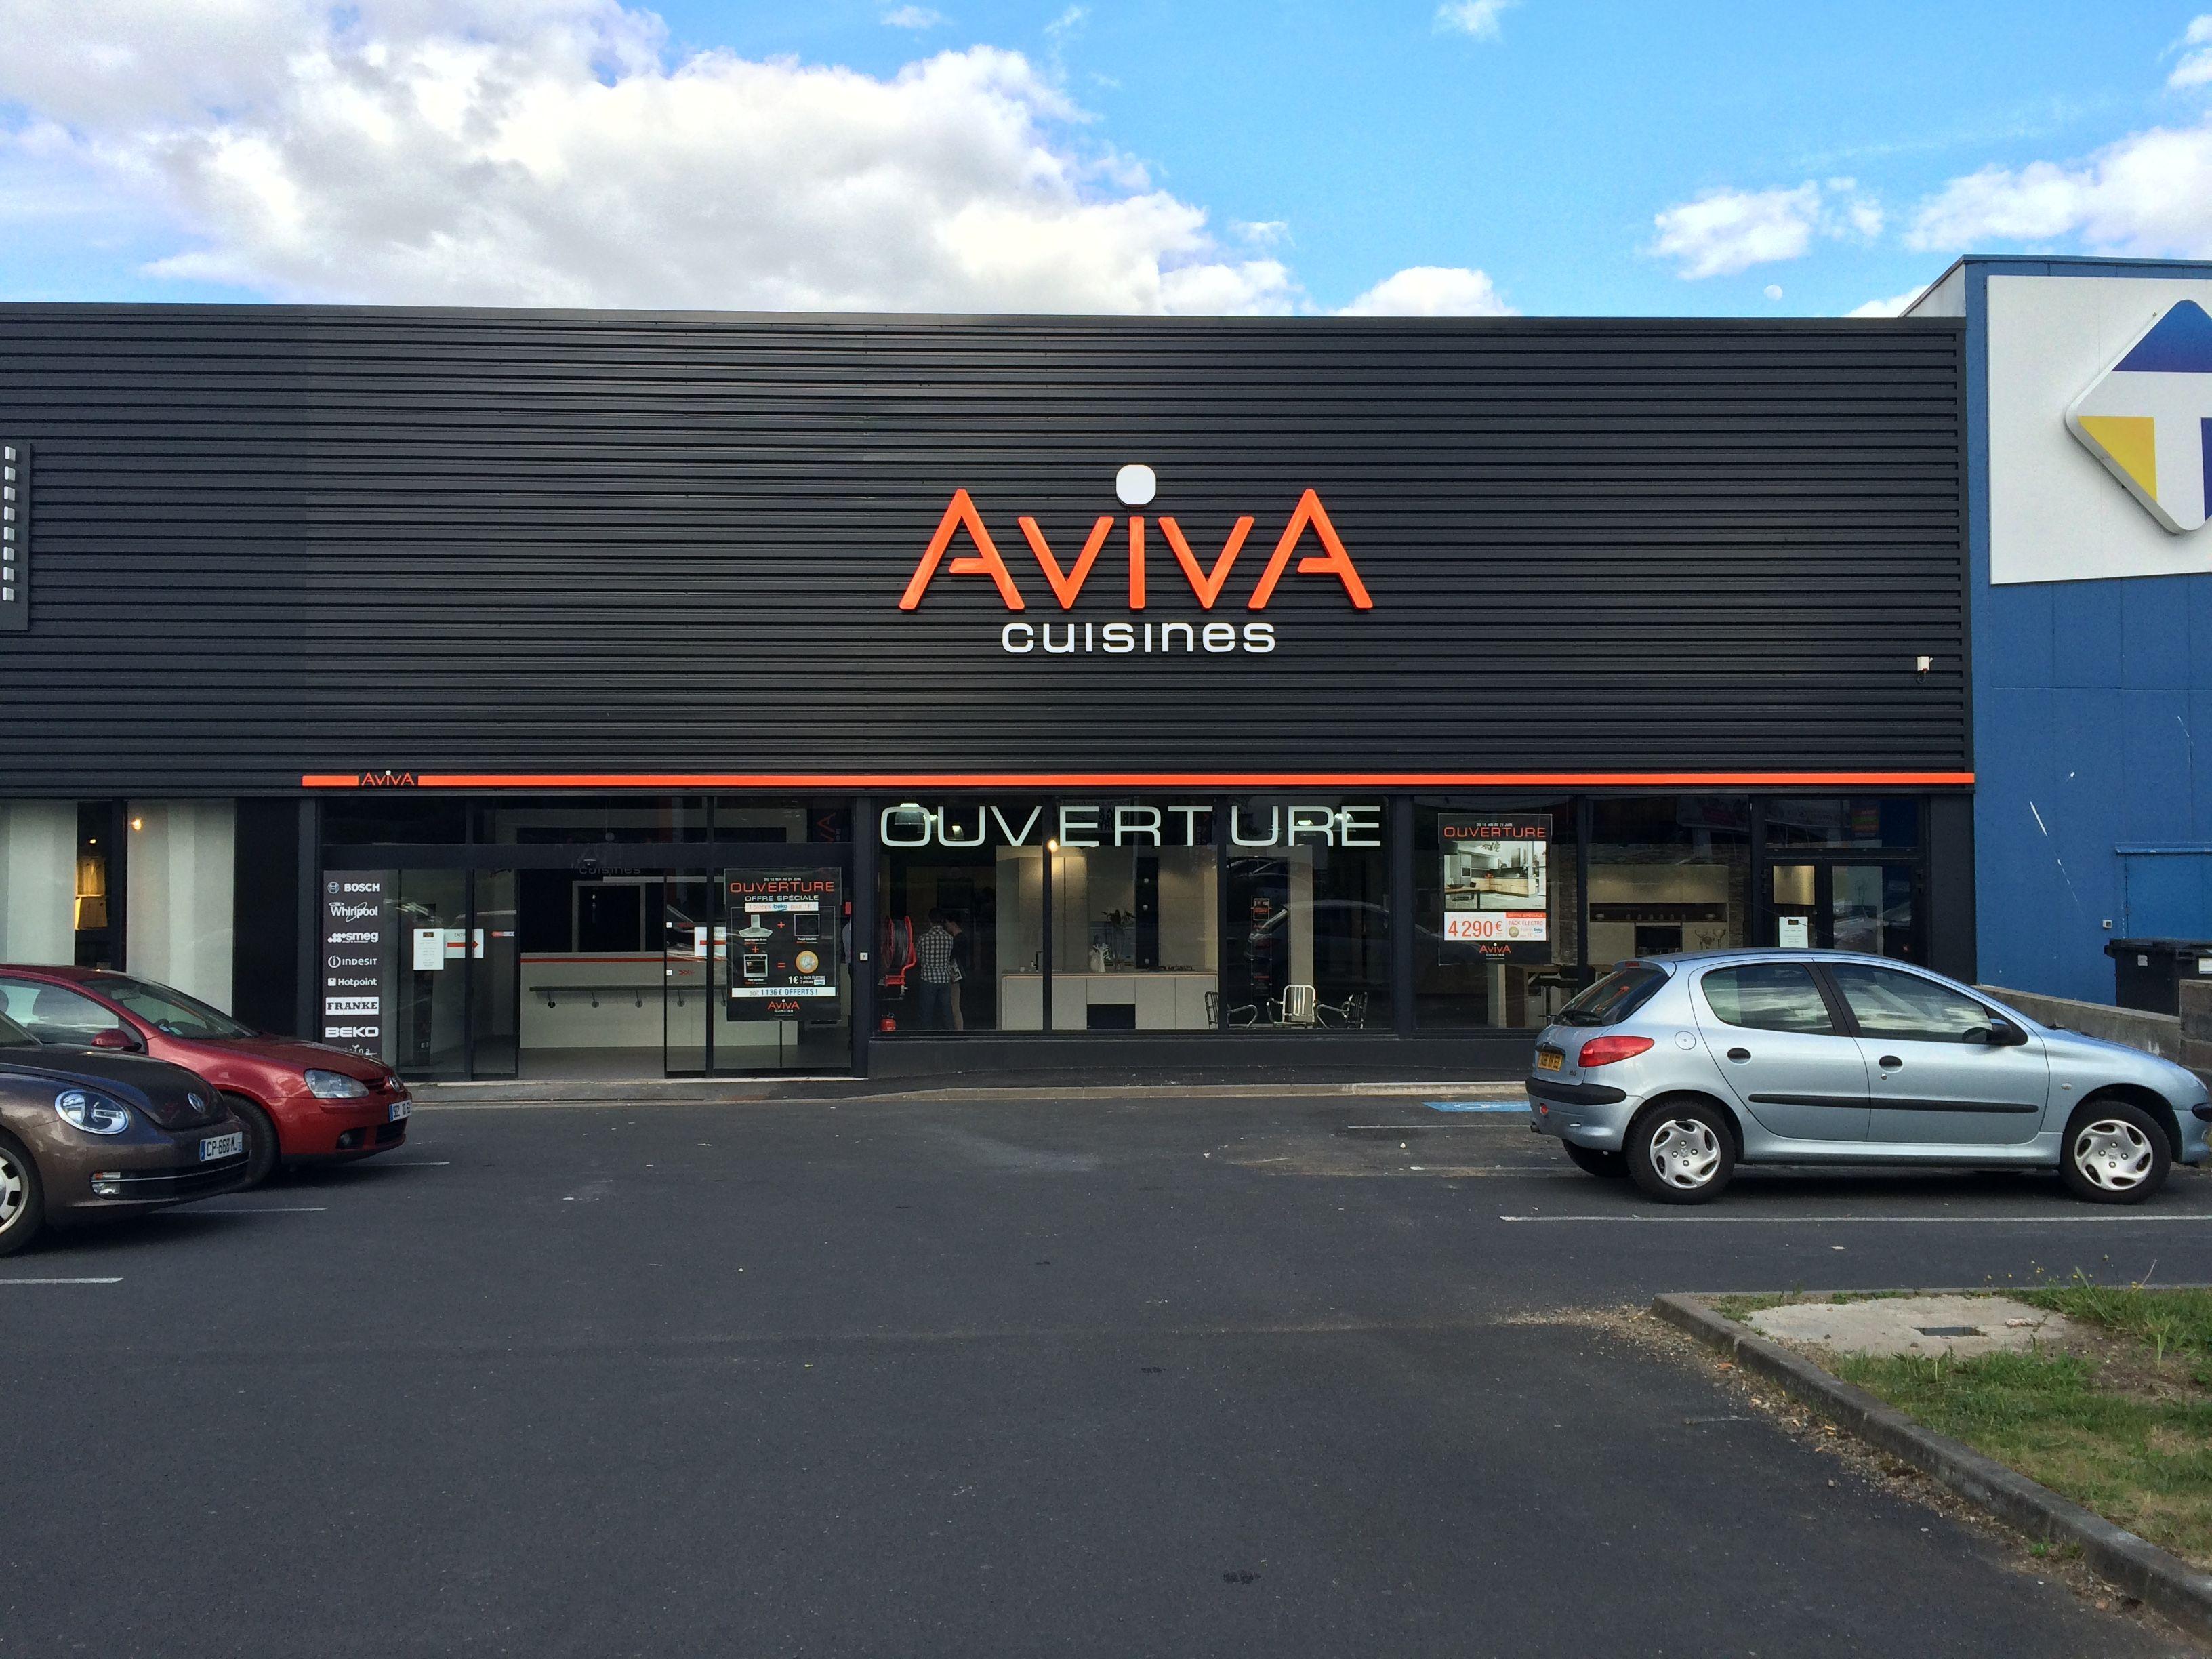 Cuisines AvivA ClermontFerrand à Auvergne ZI COURNON Avenue - Cuisinistes clermont ferrand